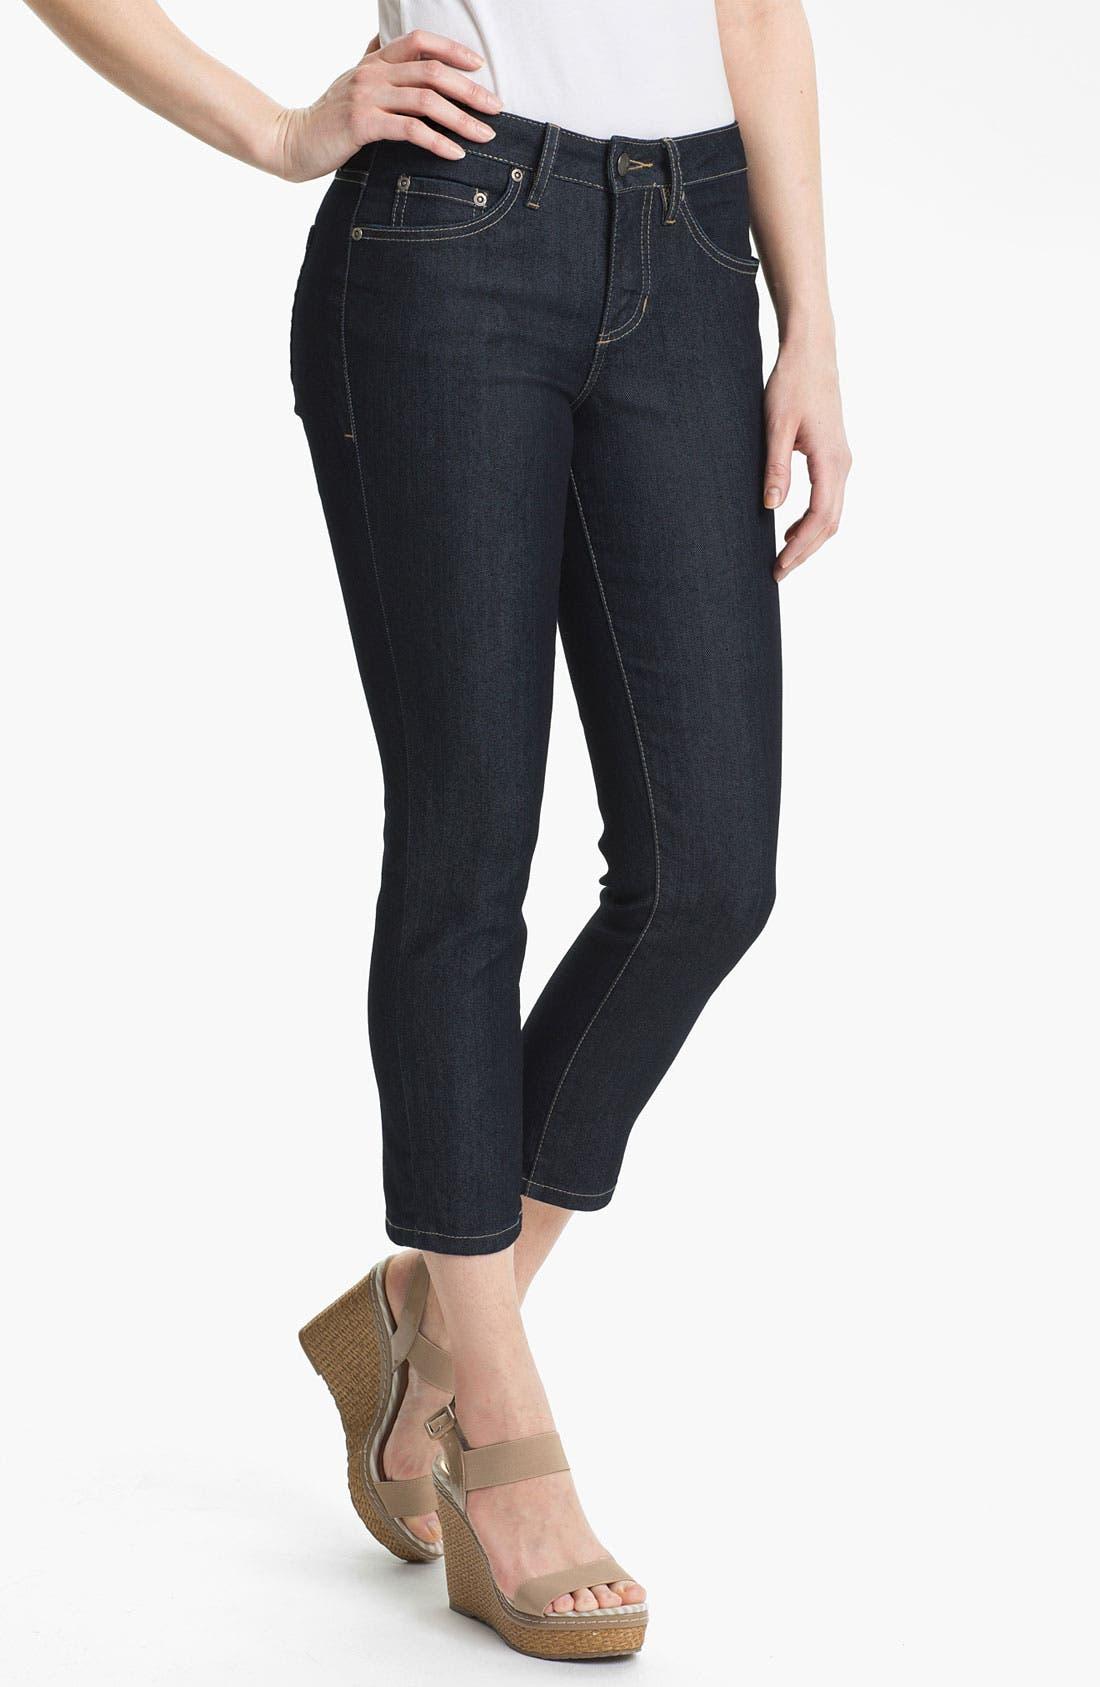 Alternate Image 1 Selected - Jag Jeans 'Reggie' Slim Crop Jeans